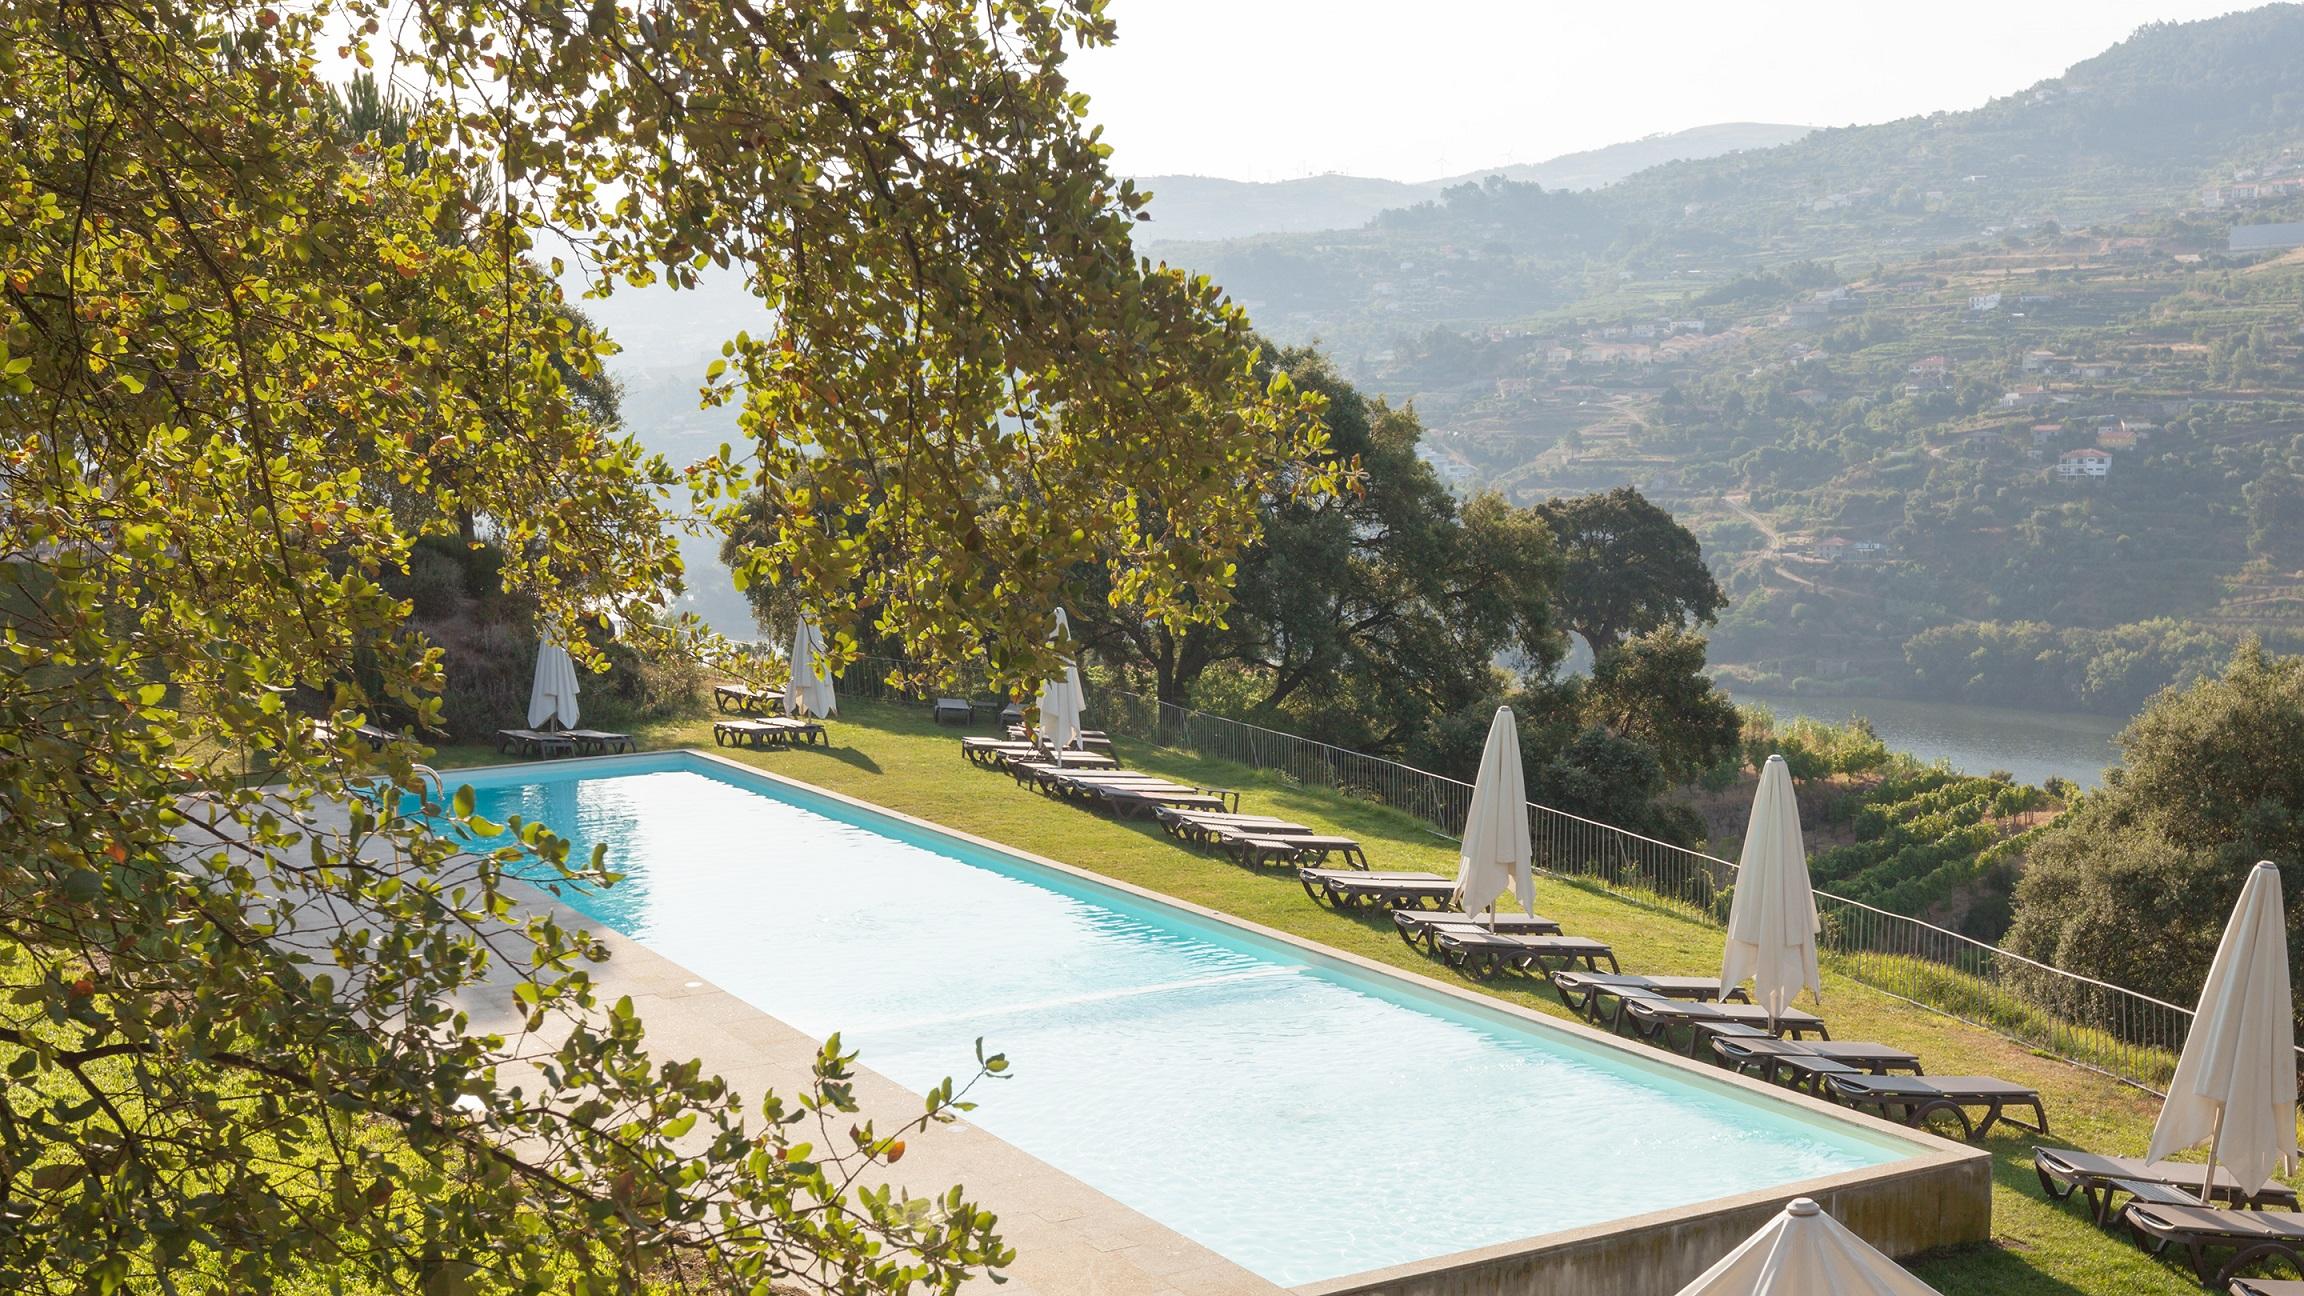 Douro Palace - Essences from Douro